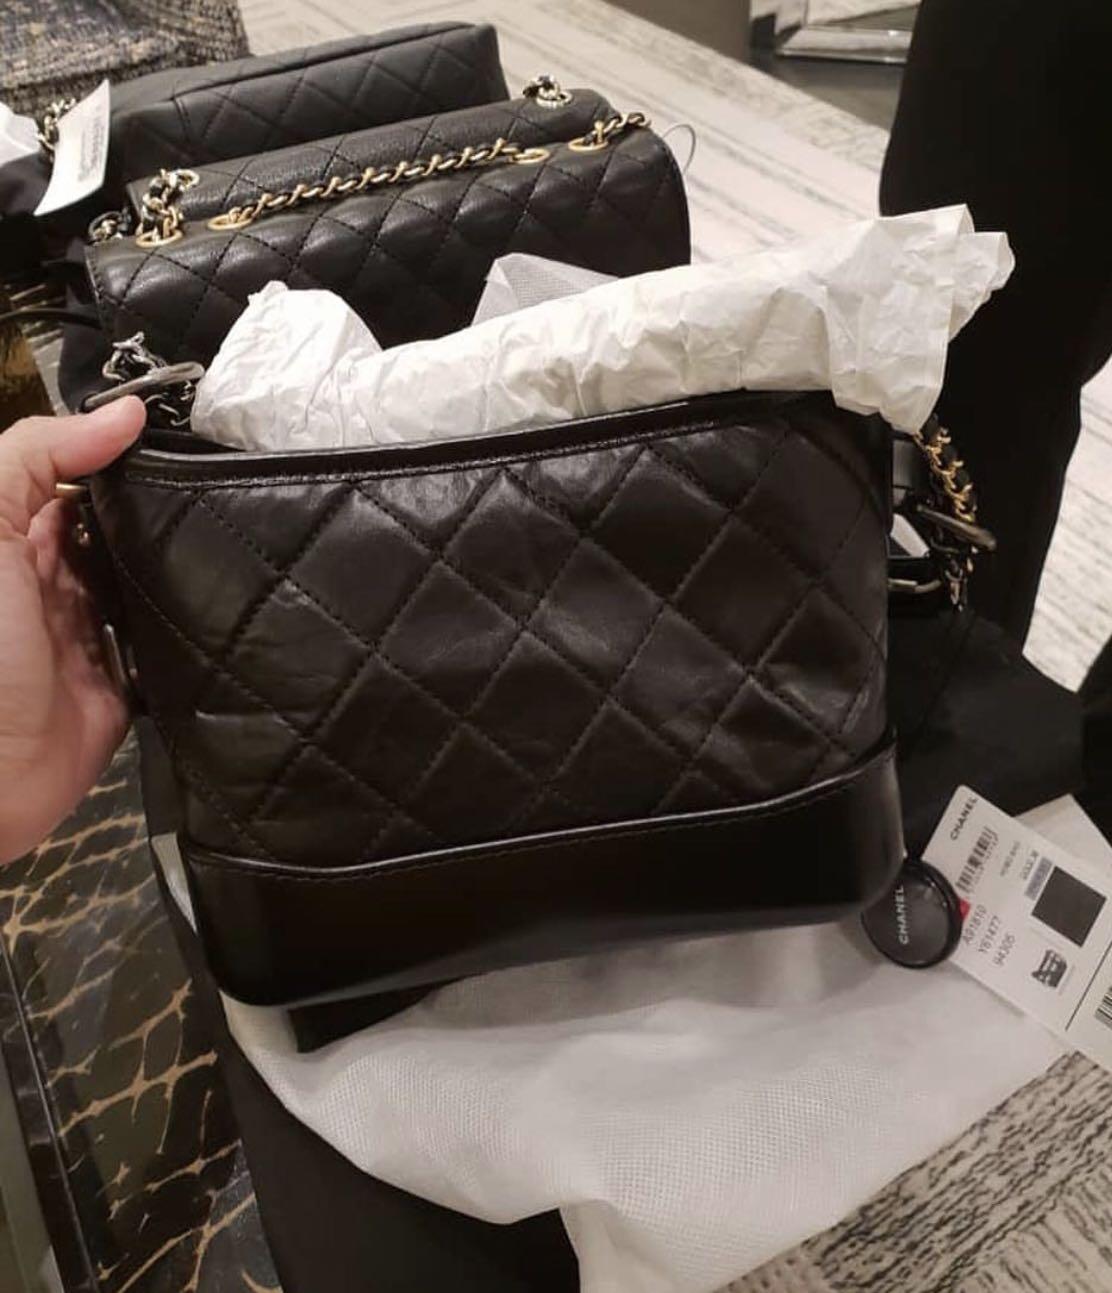 Chanel Gabrielle S, Luxury, Bags   Wallets, Handbags on Carousell 702f5a60ec